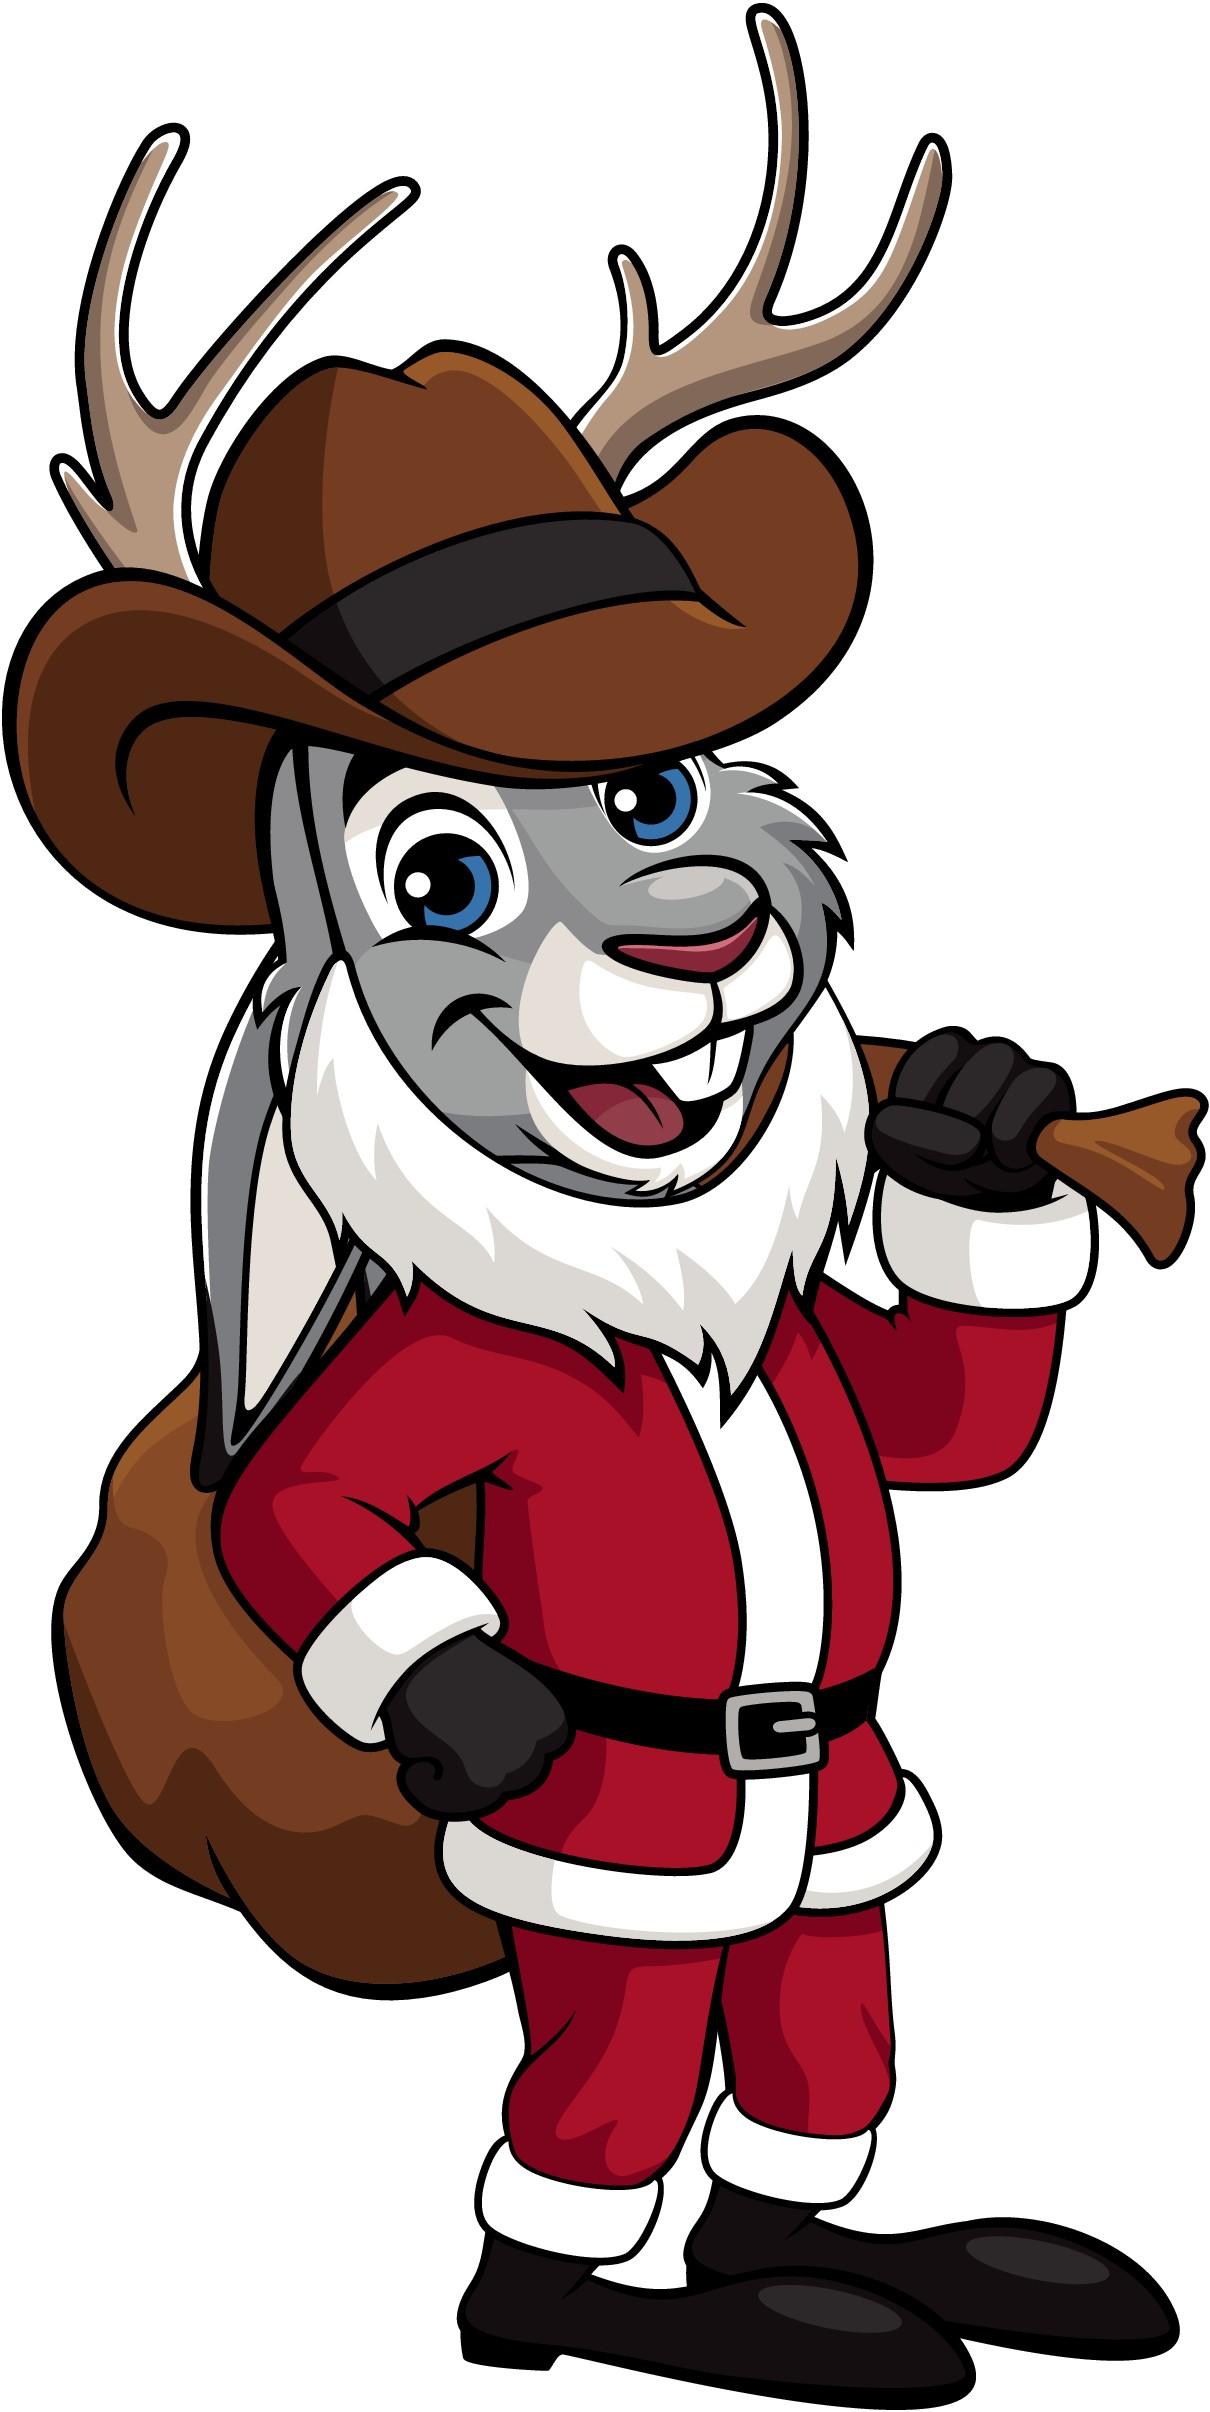 Jackalope artwork - dressed as Santa with cowboy hat